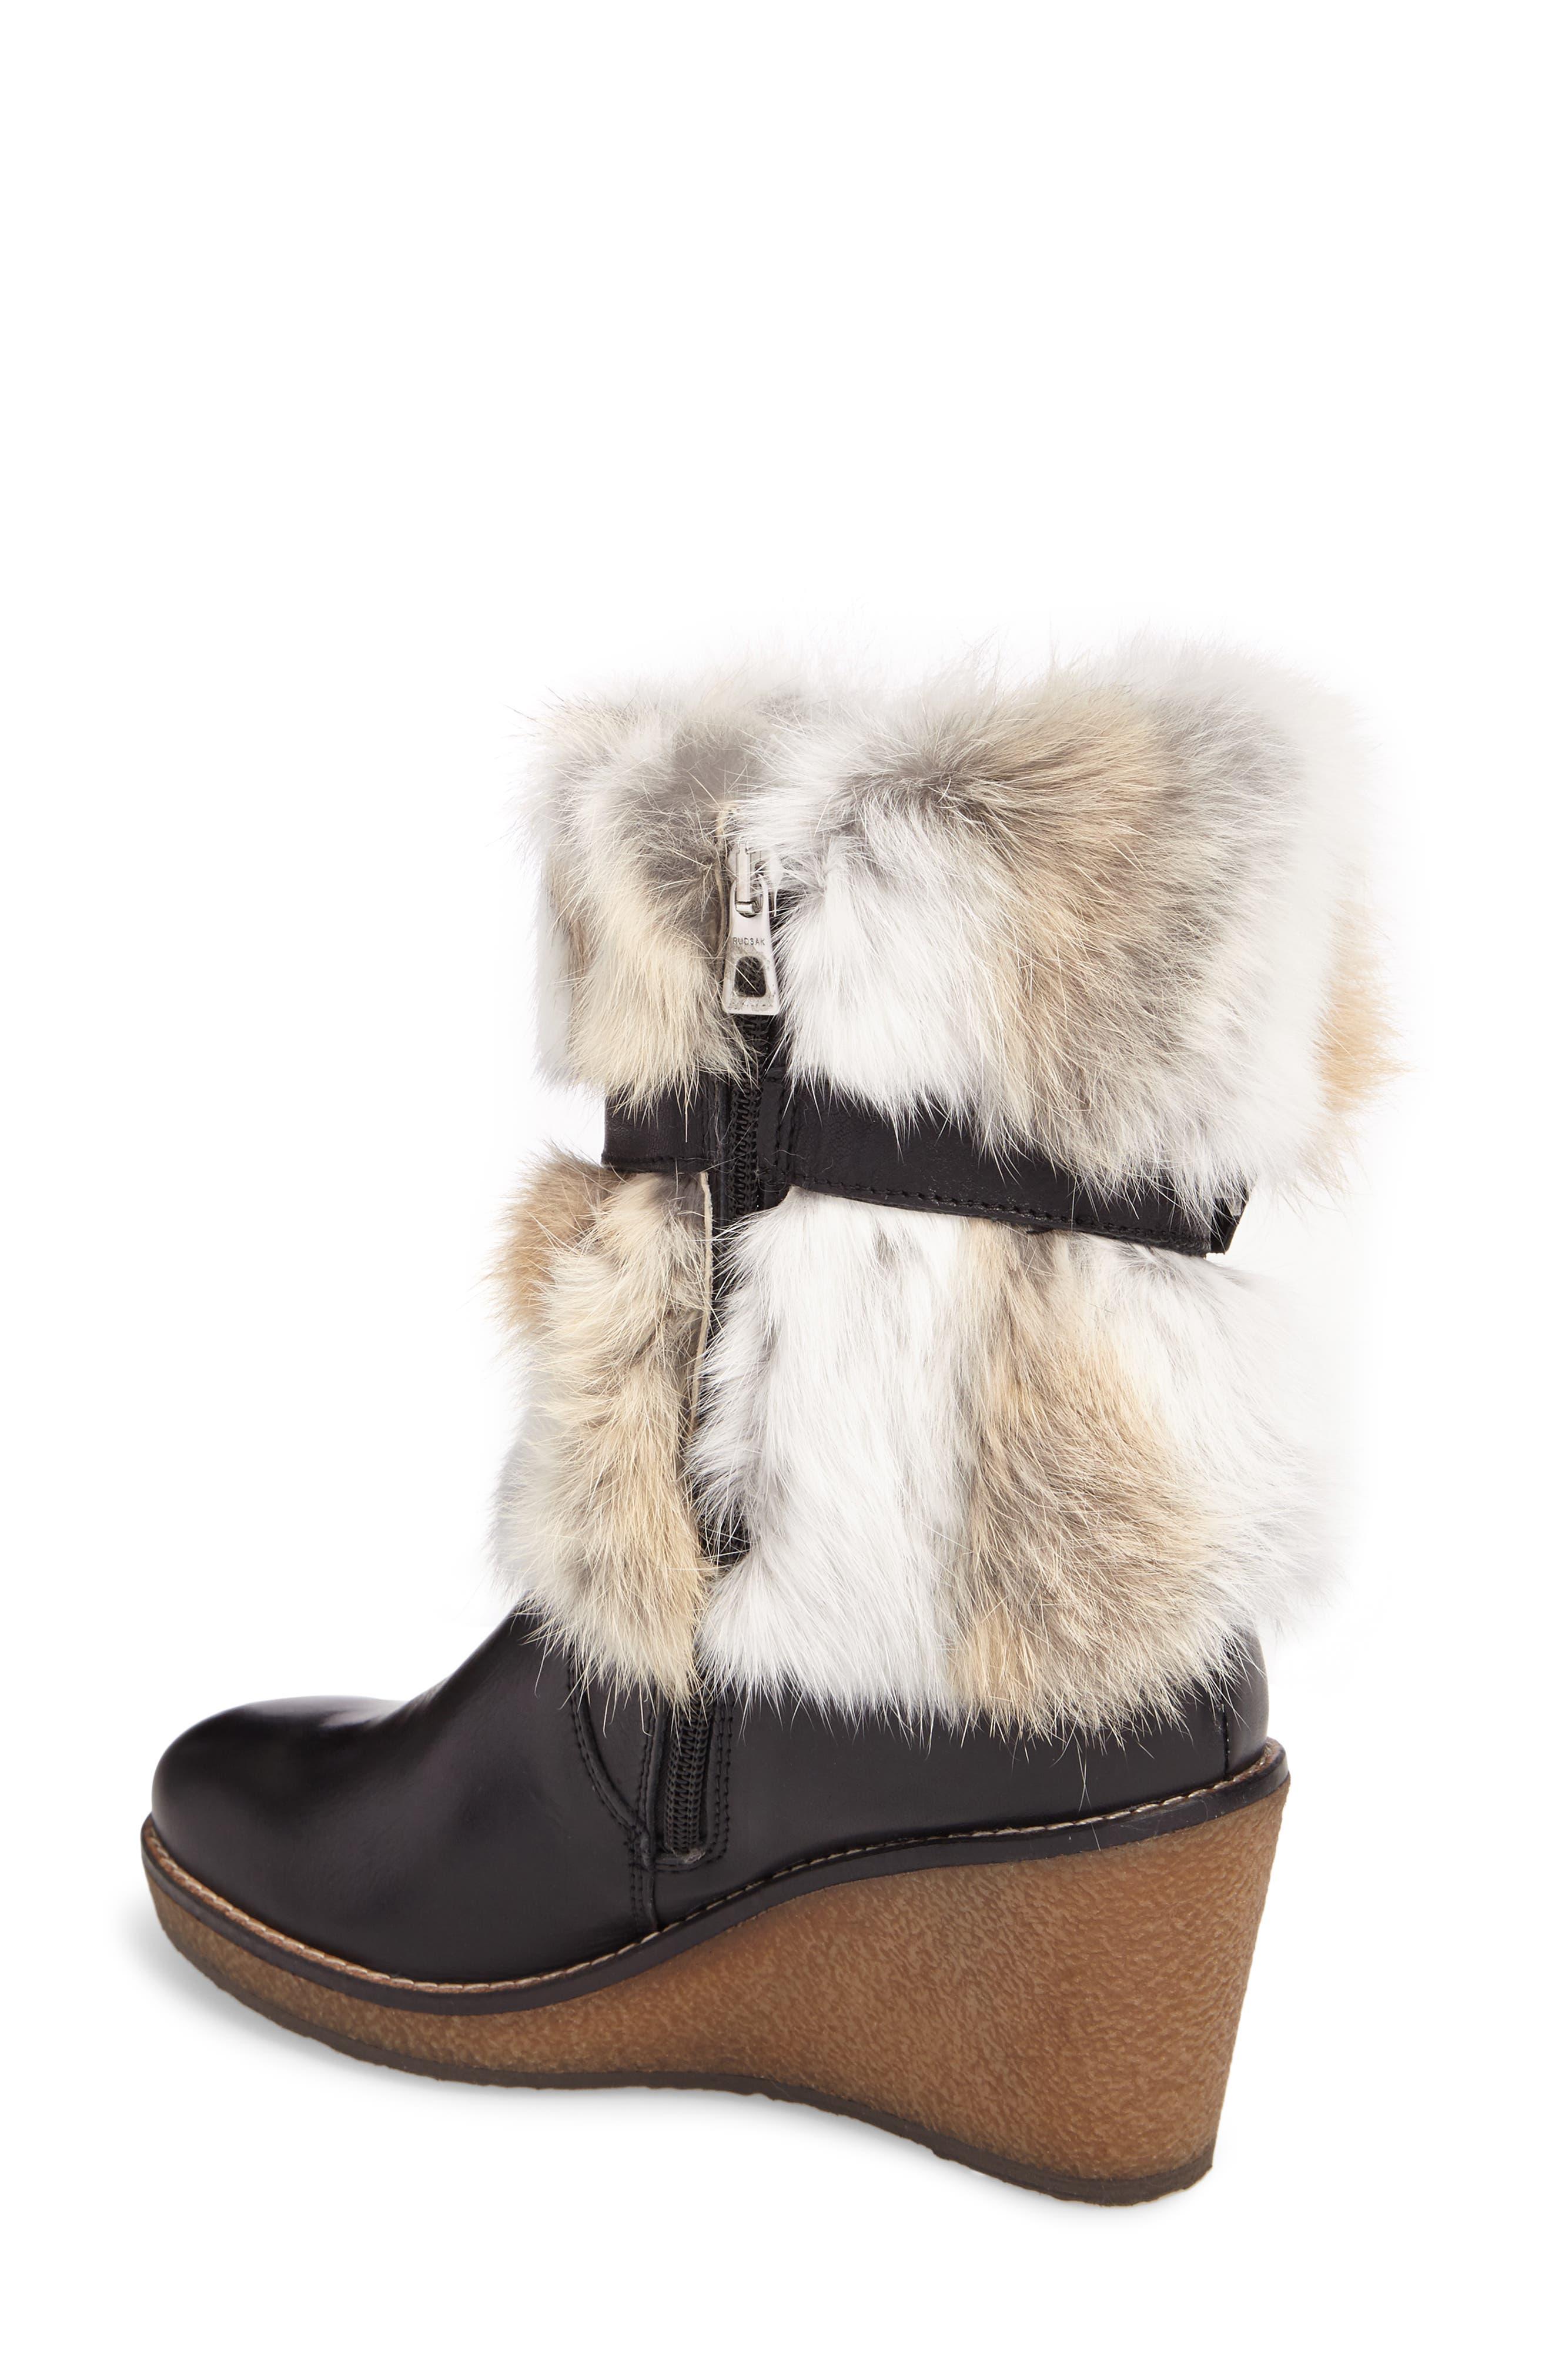 Tasarla Genuine Rabbit Fur Trim Boot,                             Alternate thumbnail 2, color,                             001